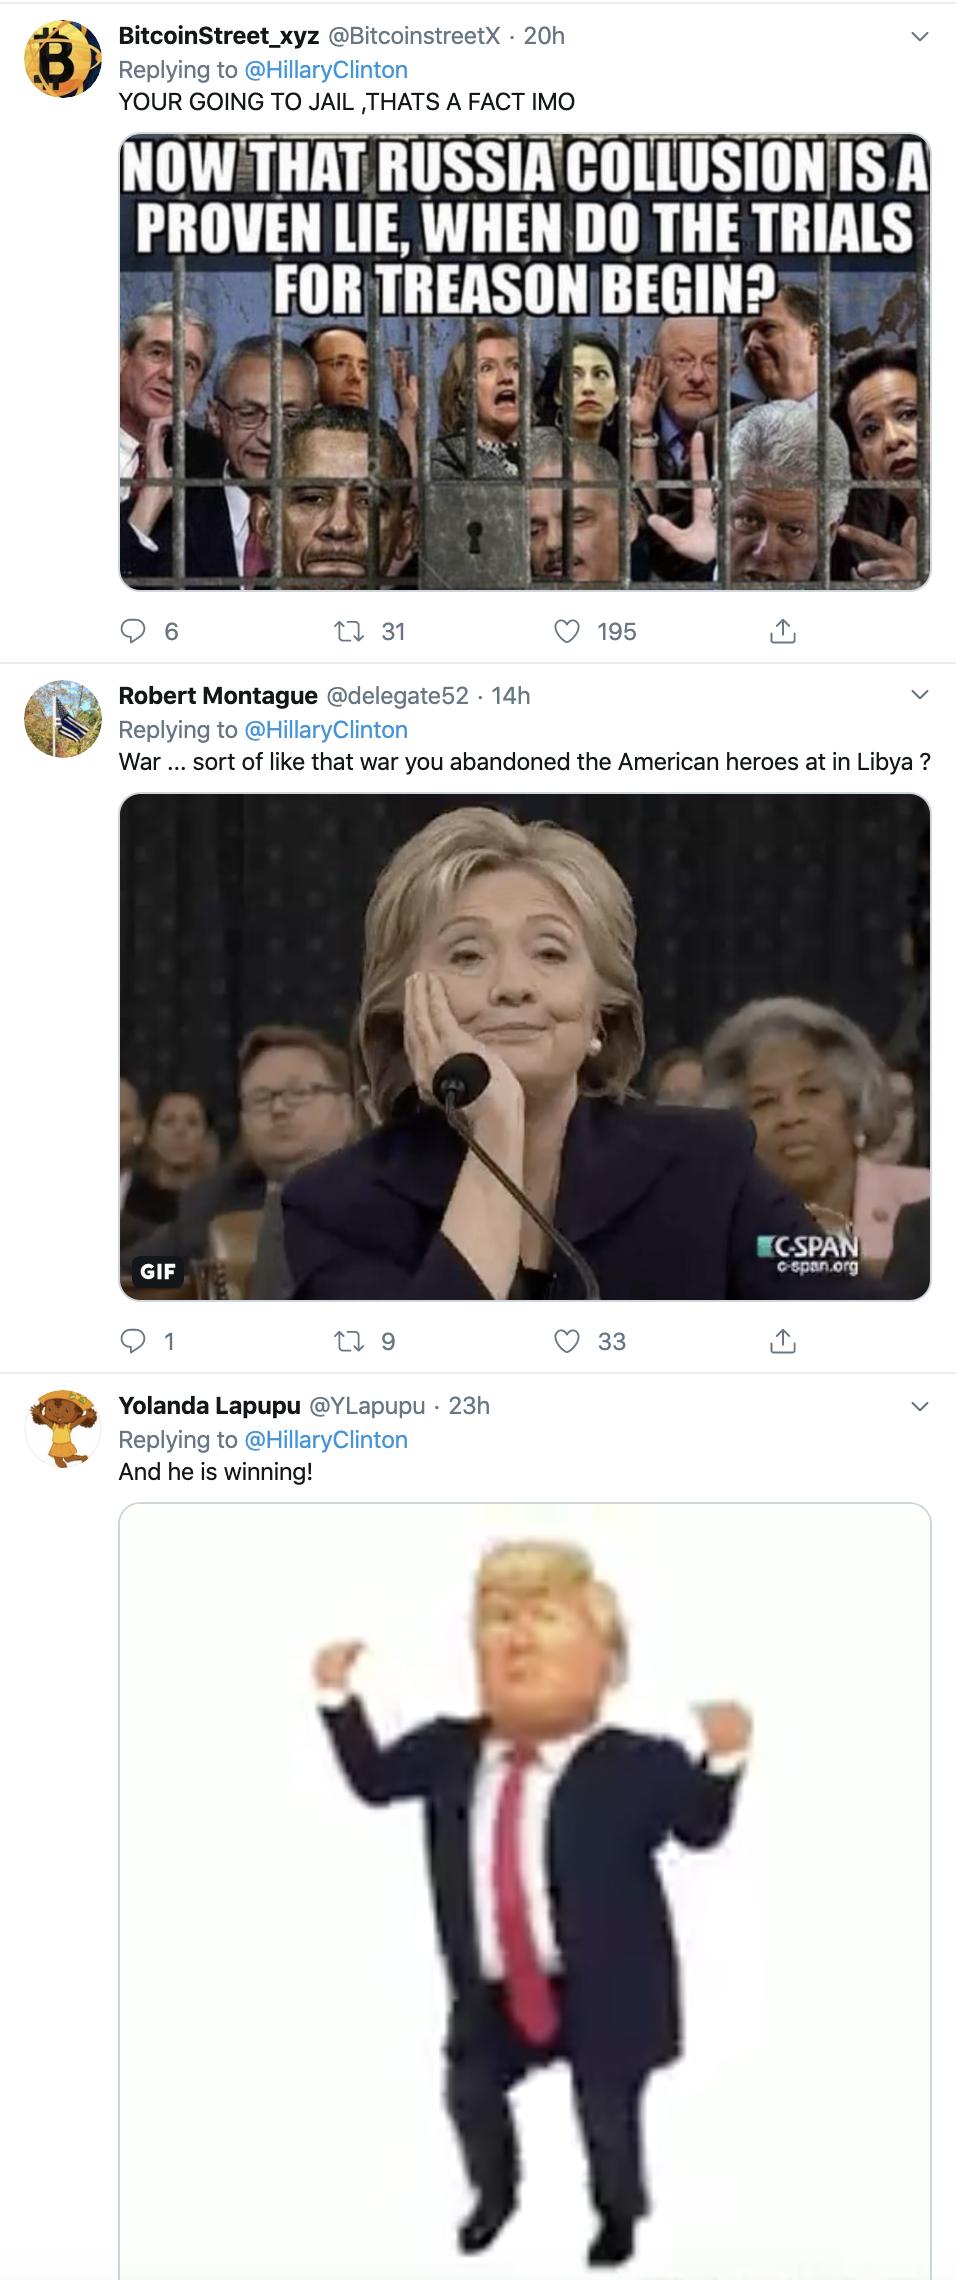 Screen-Shot-2019-12-11-at-9.13.03-AM Clinton Embarrasses Trump With Impeachment Tweet Trolling Featured Hillary Clinton Impeachment Politics